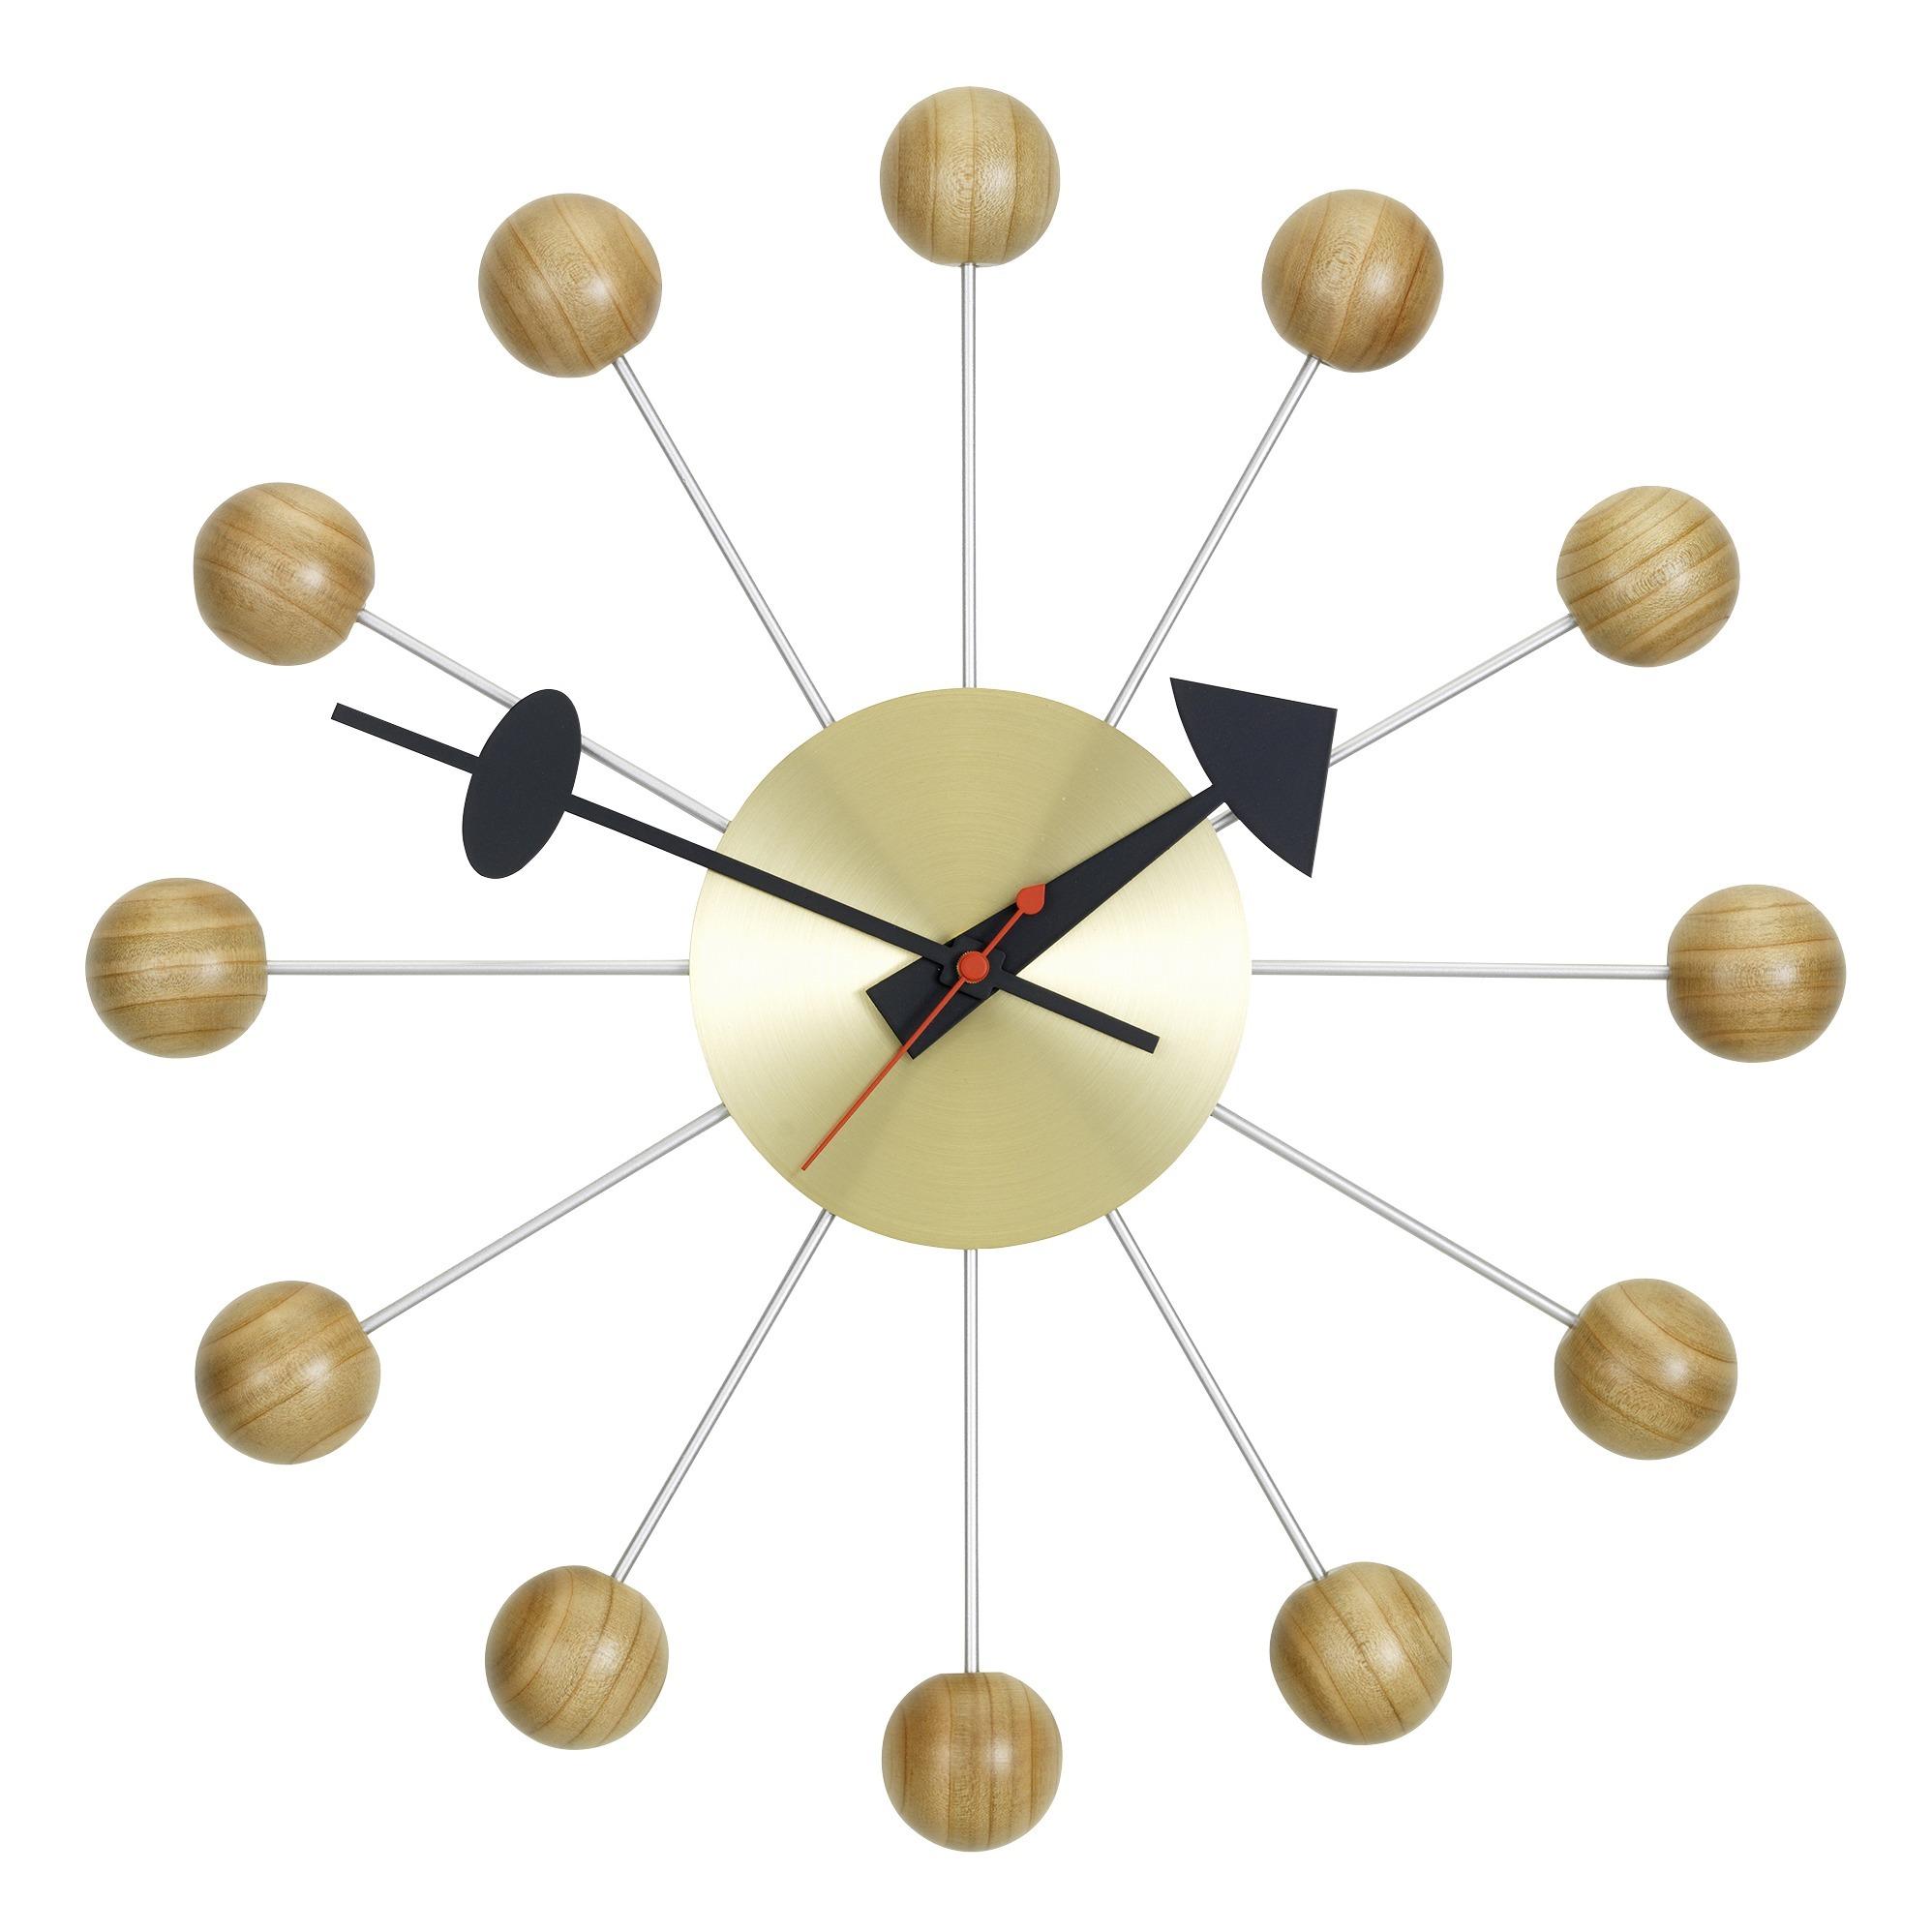 Wanduhr Ball Clock- George Nelson, 1948